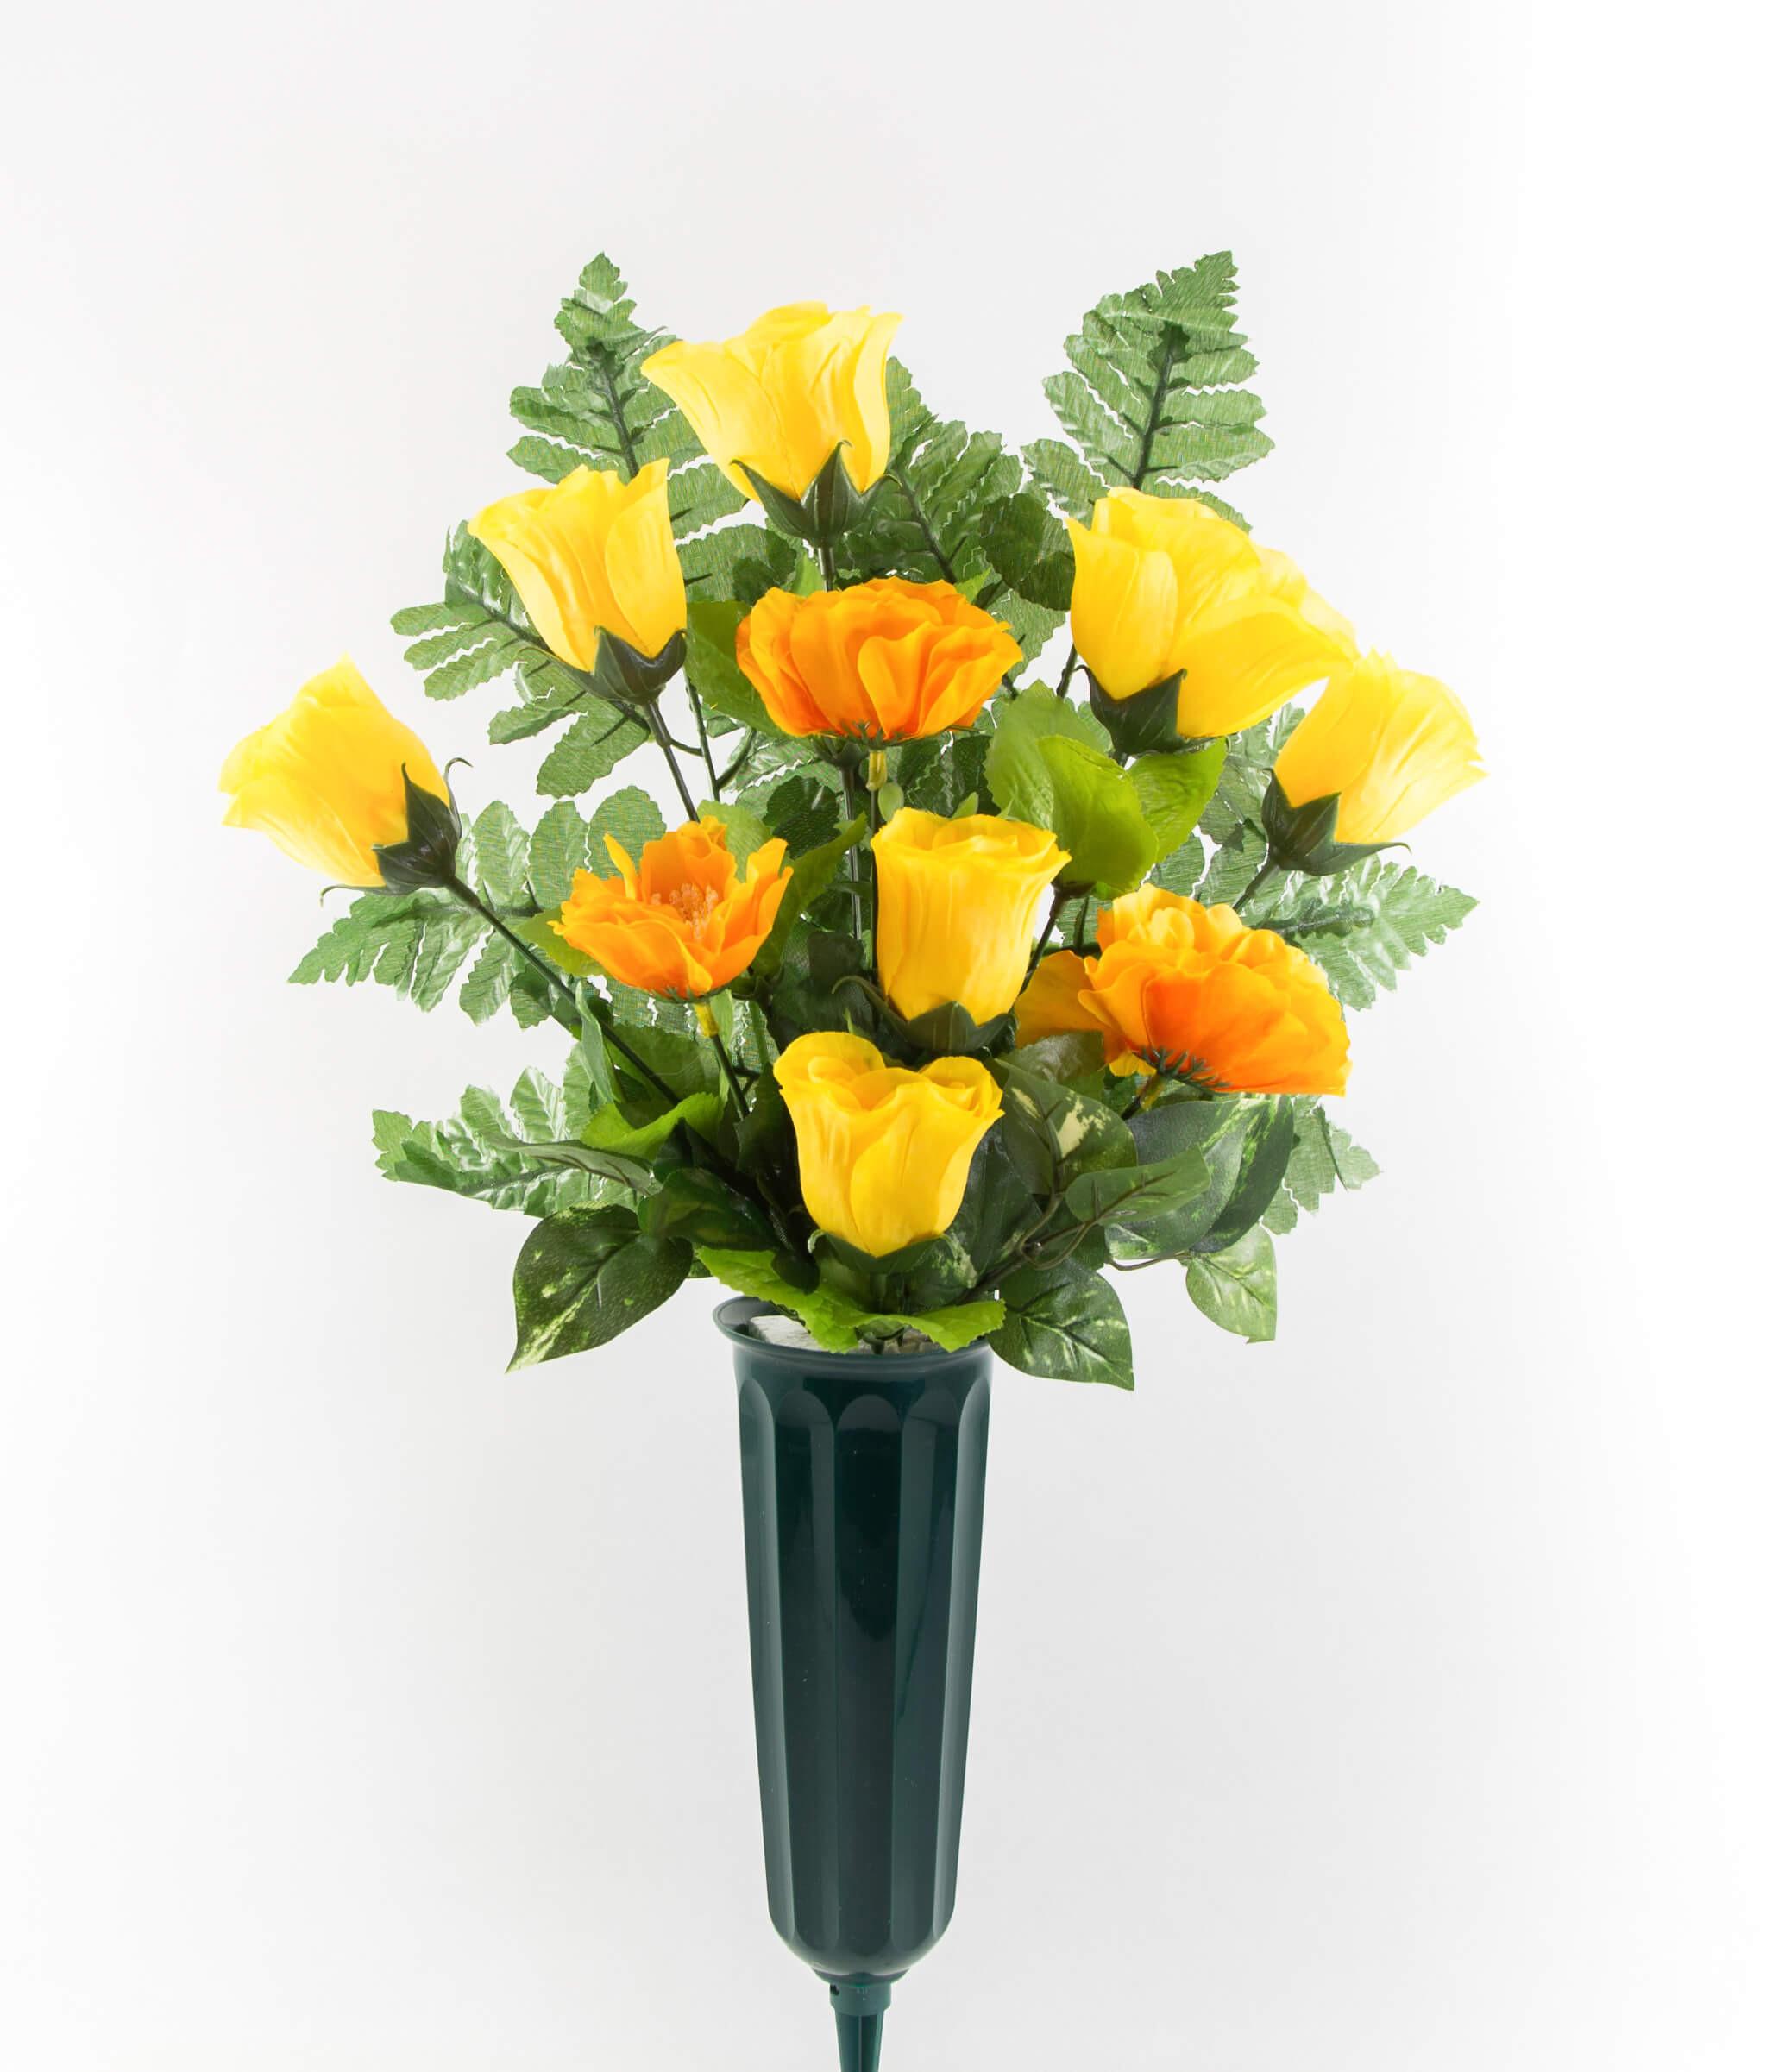 personalised grave vase of memorial flower vase www topsimages com throughout cemetery vases memorial decorations jpg 2069x2402 memorial flower vase